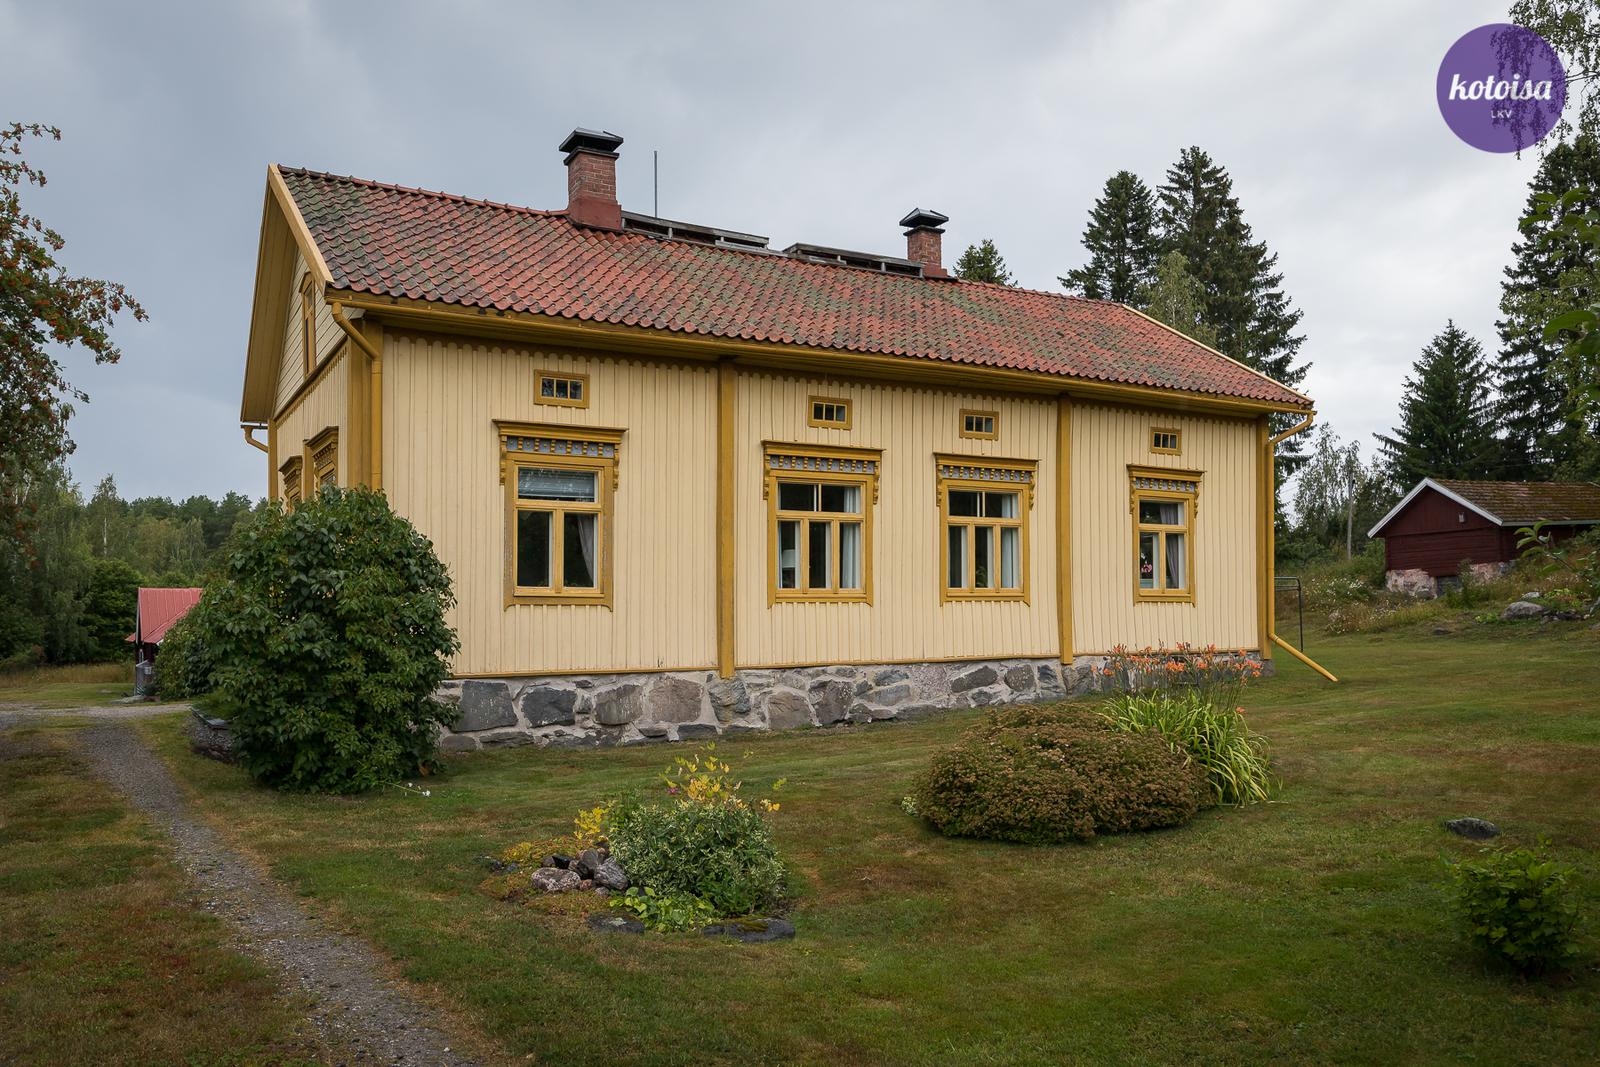 Tontti ja talo